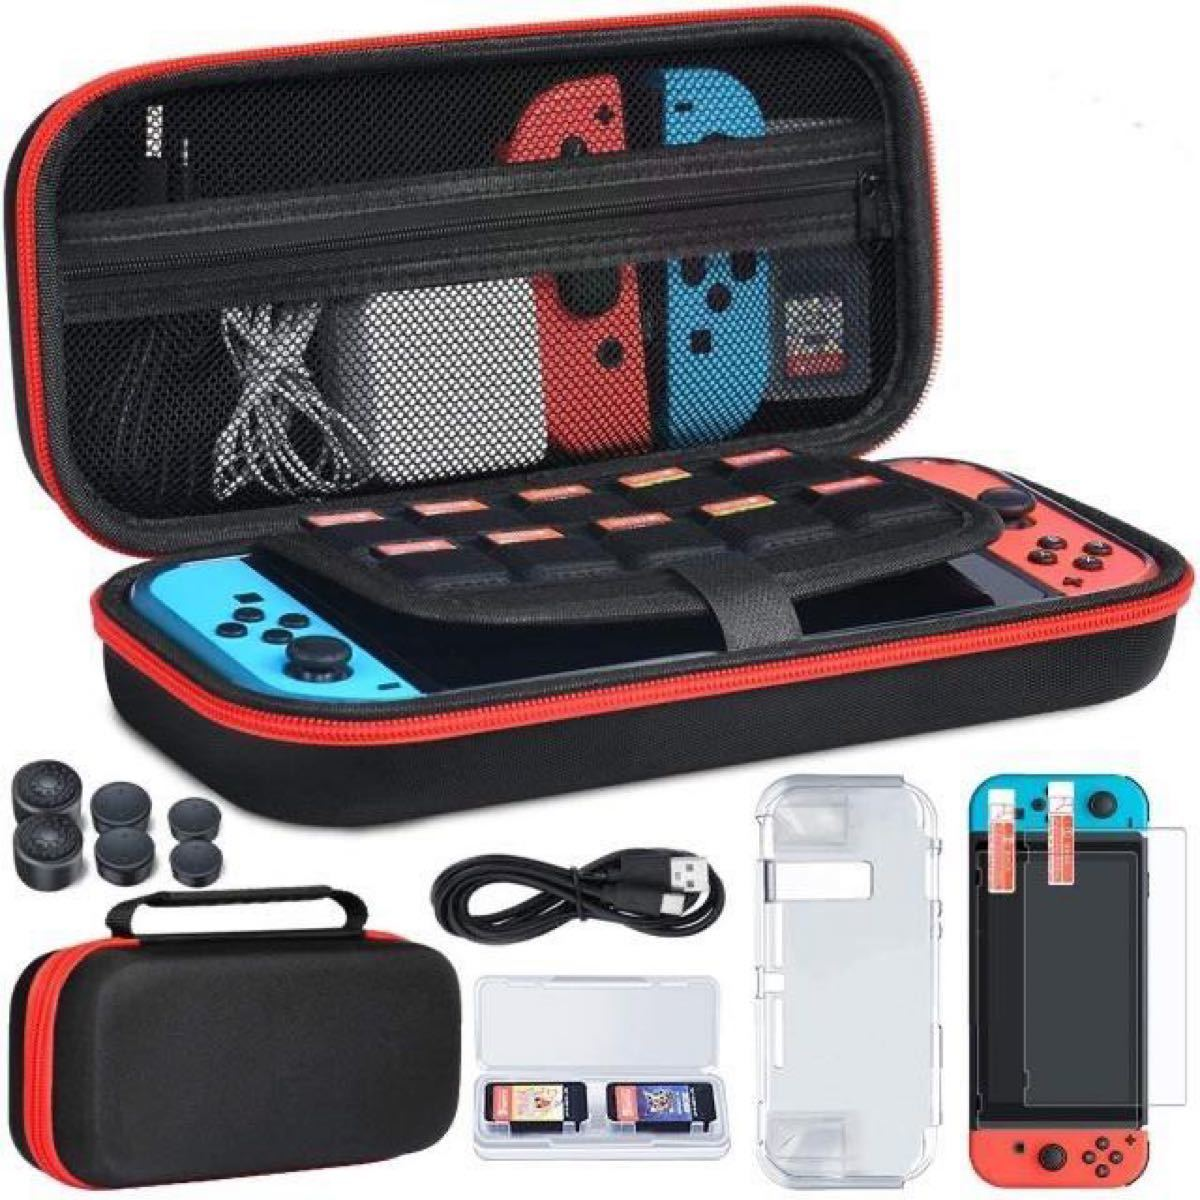 Nintendo Switch 任天堂スイッチケース 収納バッグ 任天堂スイッチ